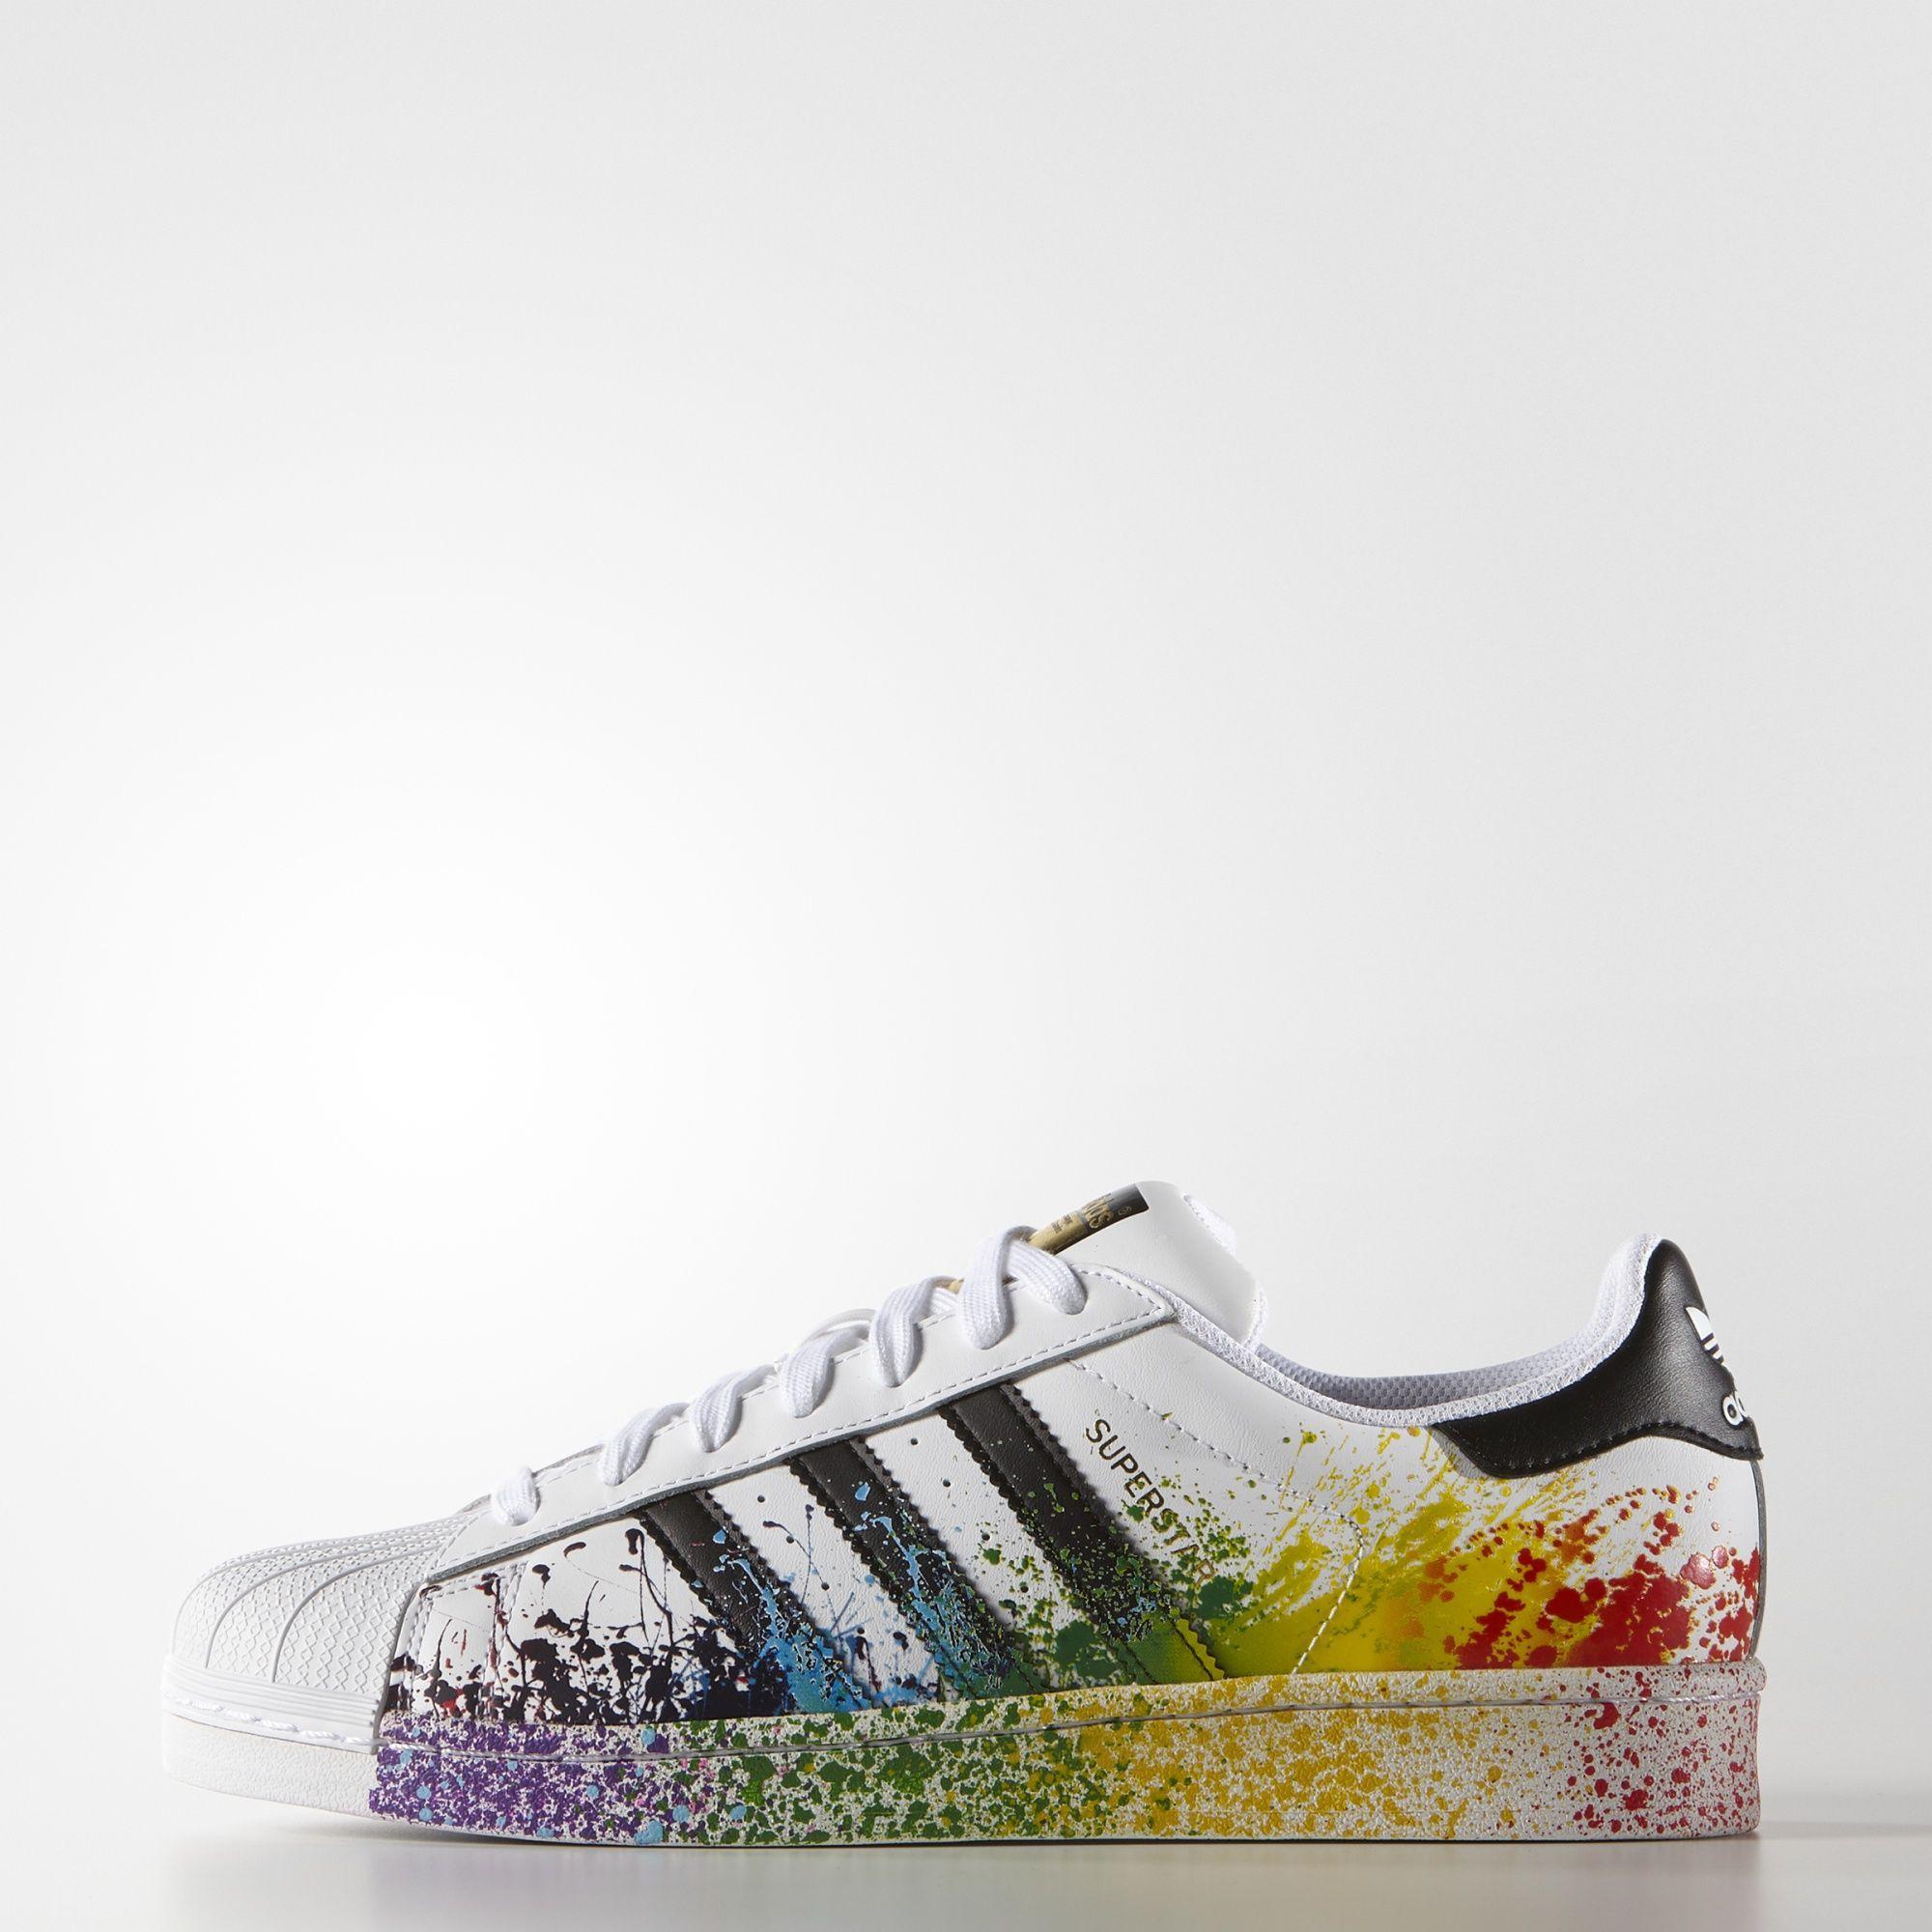 superstar, Adidas superstar shoes